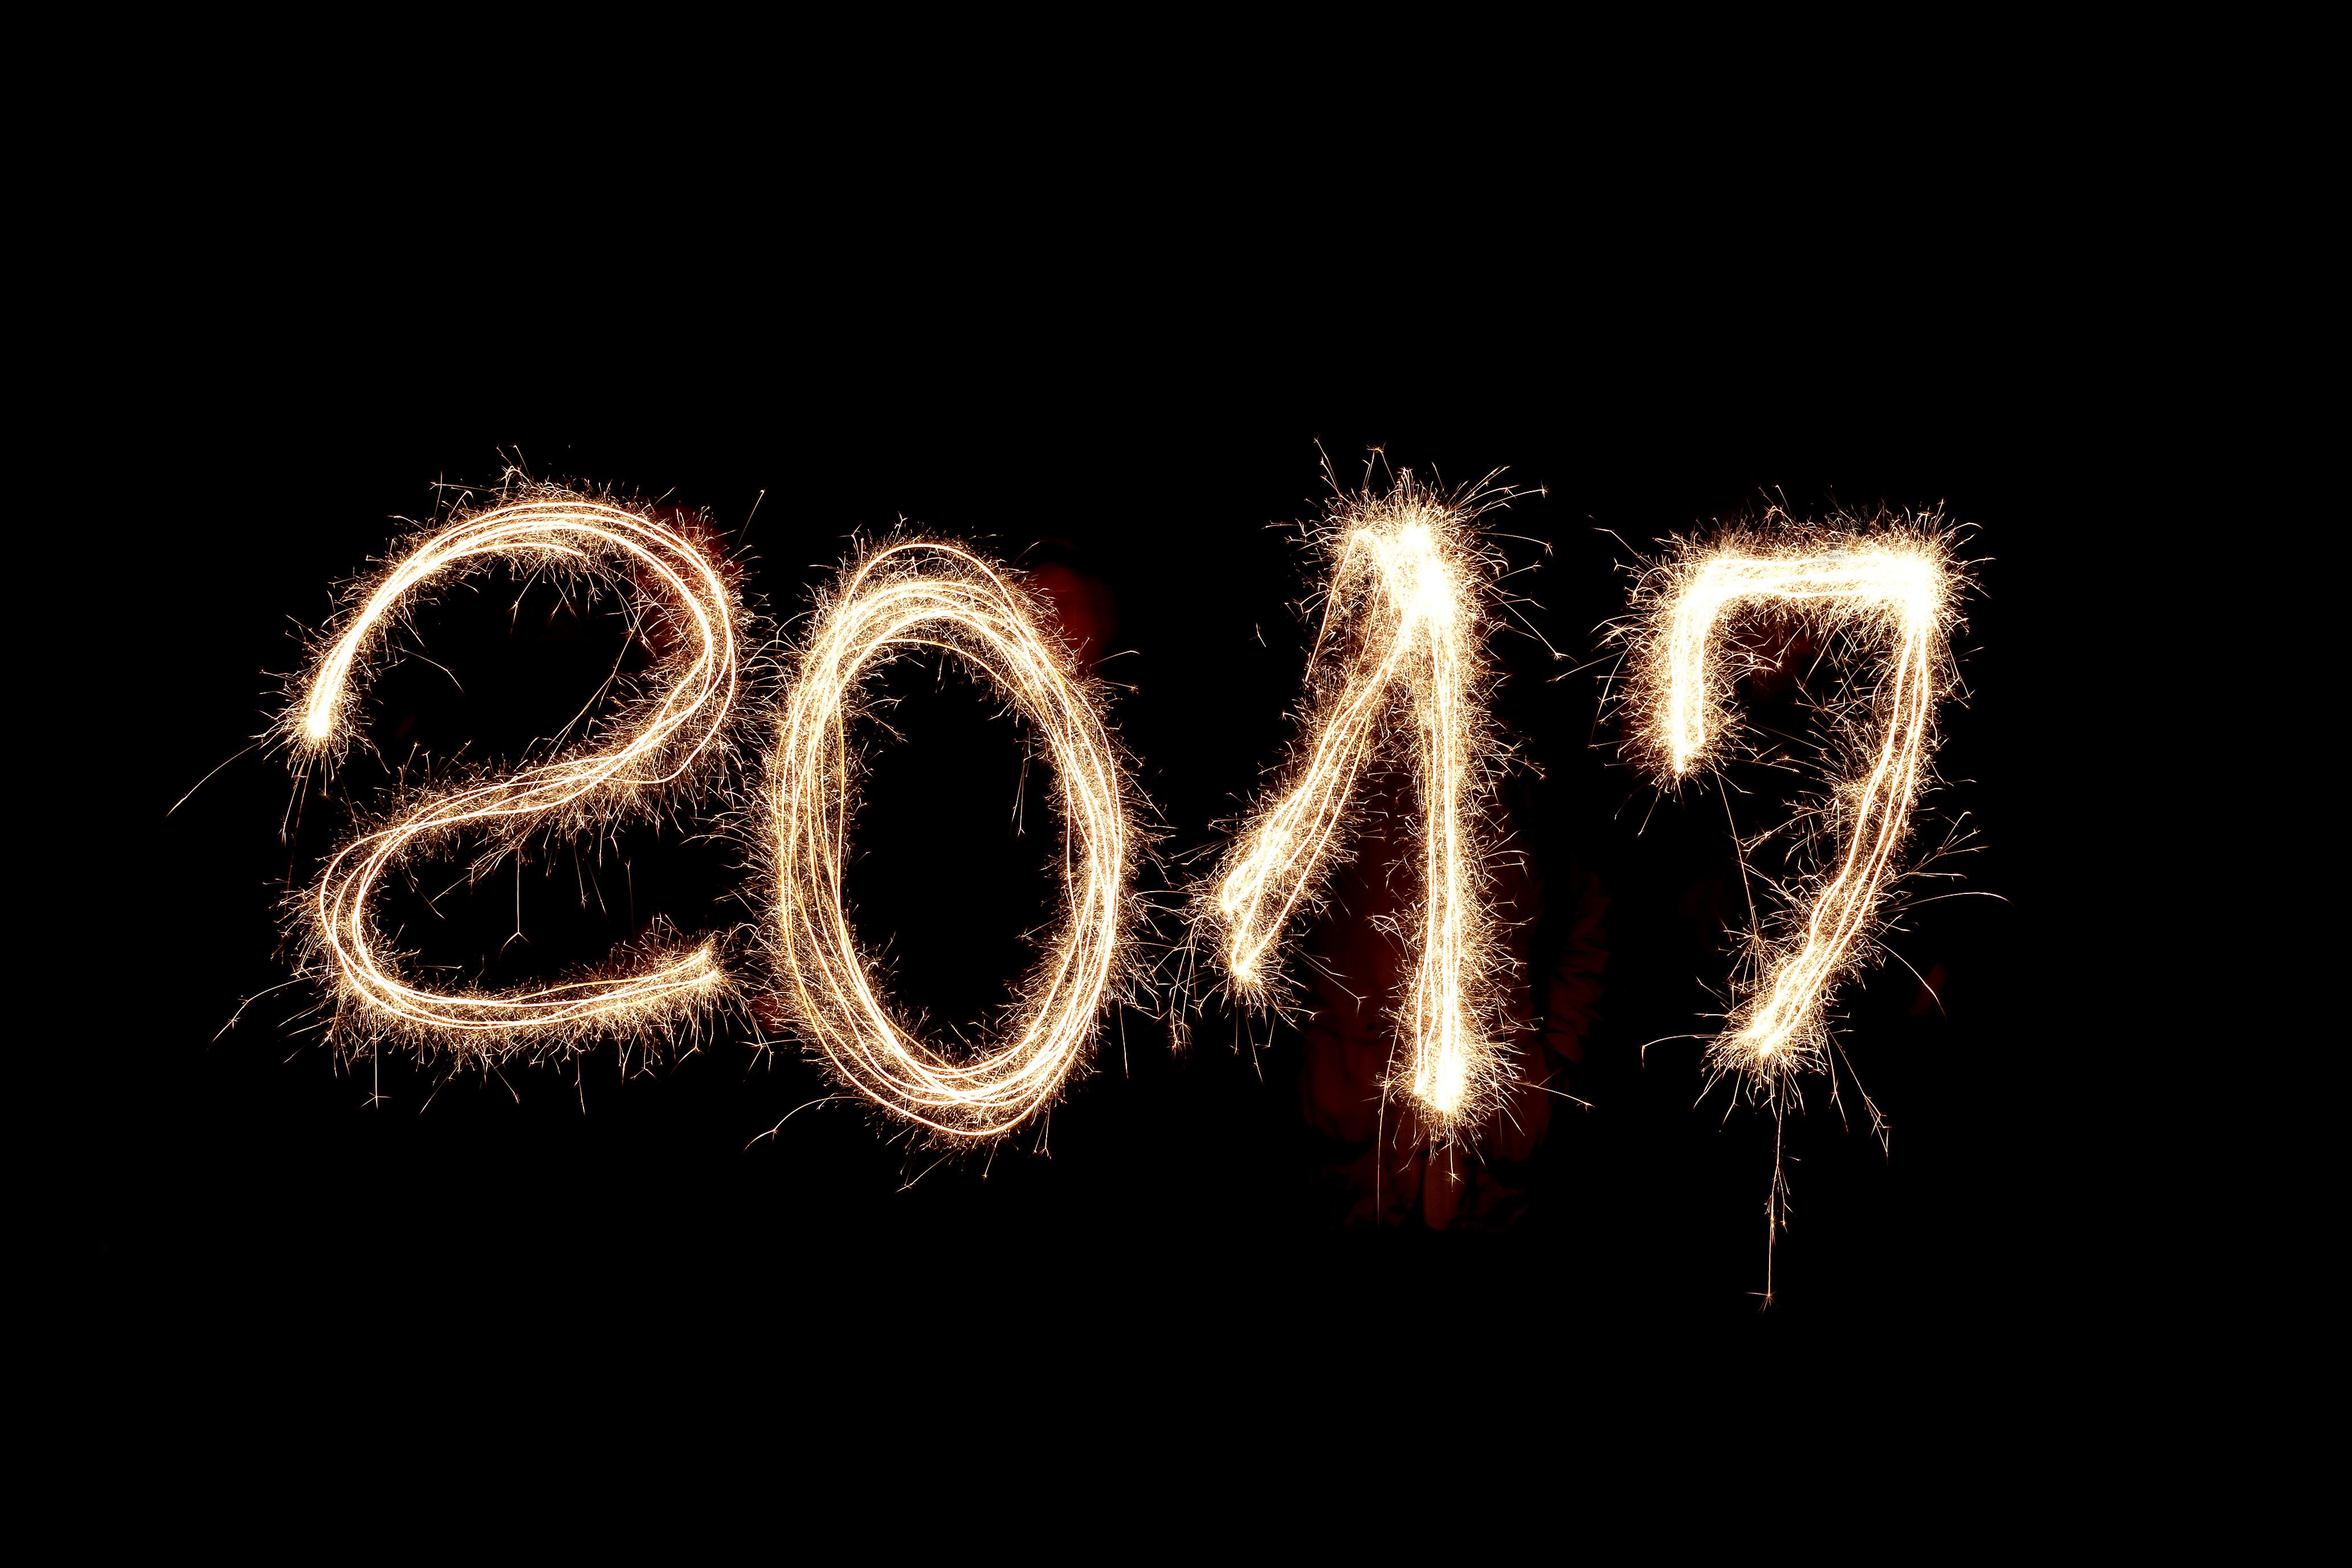 Gambar jumlah kilau pembuatan petasan tahun baru lingkaran gambar jumlah kilau pembuatan petasan tahun baru lingkaran fon kembang api ilustrasi teks 2017 malam tahun baru hari tahun baru seni kembang voltagebd Images